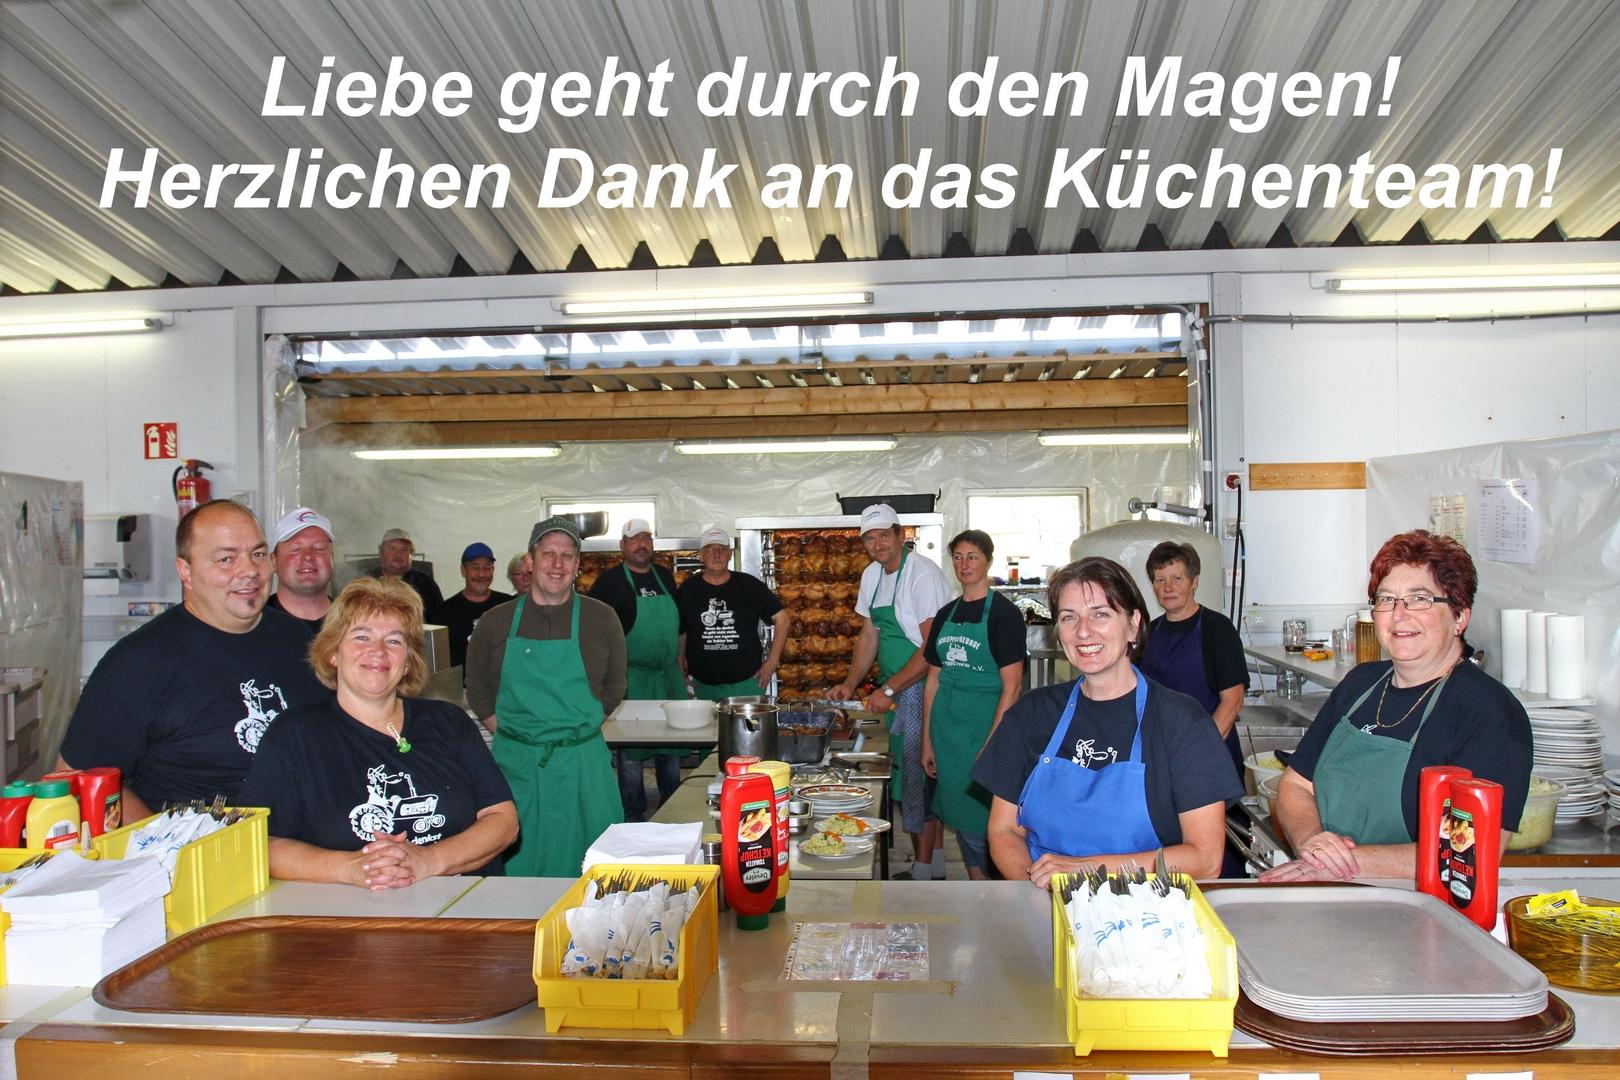 2018_09_14-16 Schleppertreffen Schmiechen  16